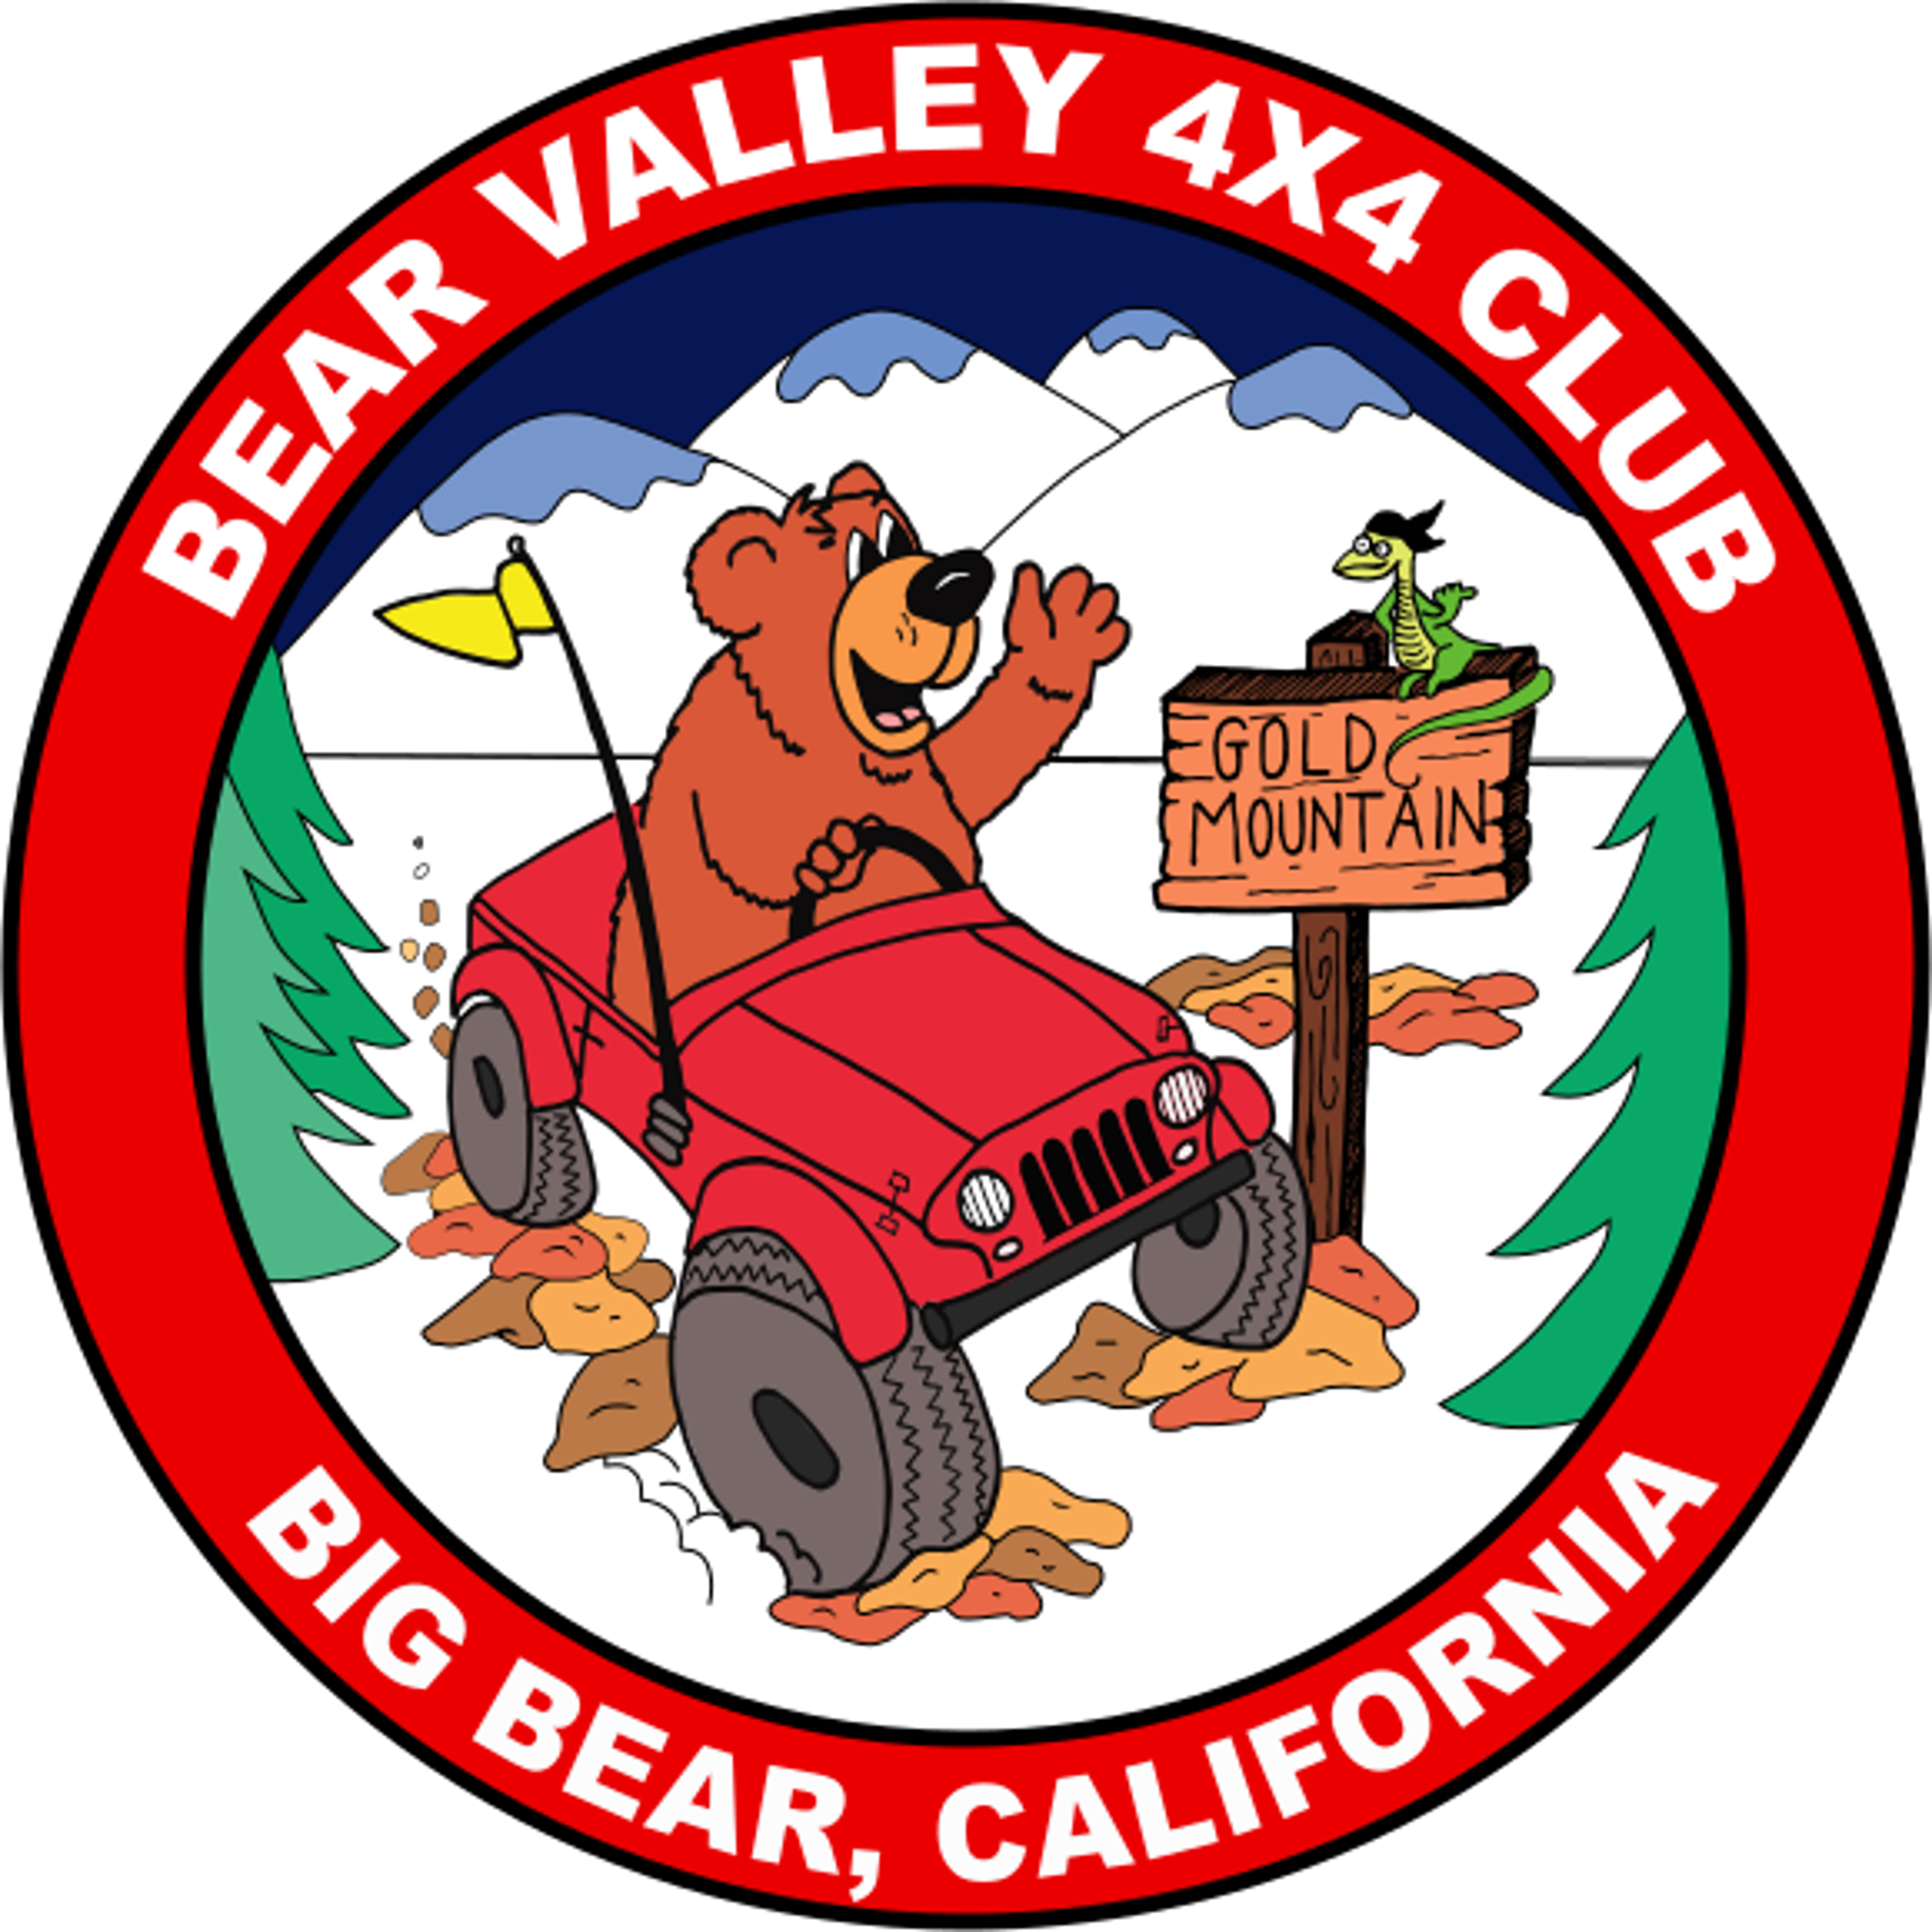 Bear valley a family. Organization clipart club organization